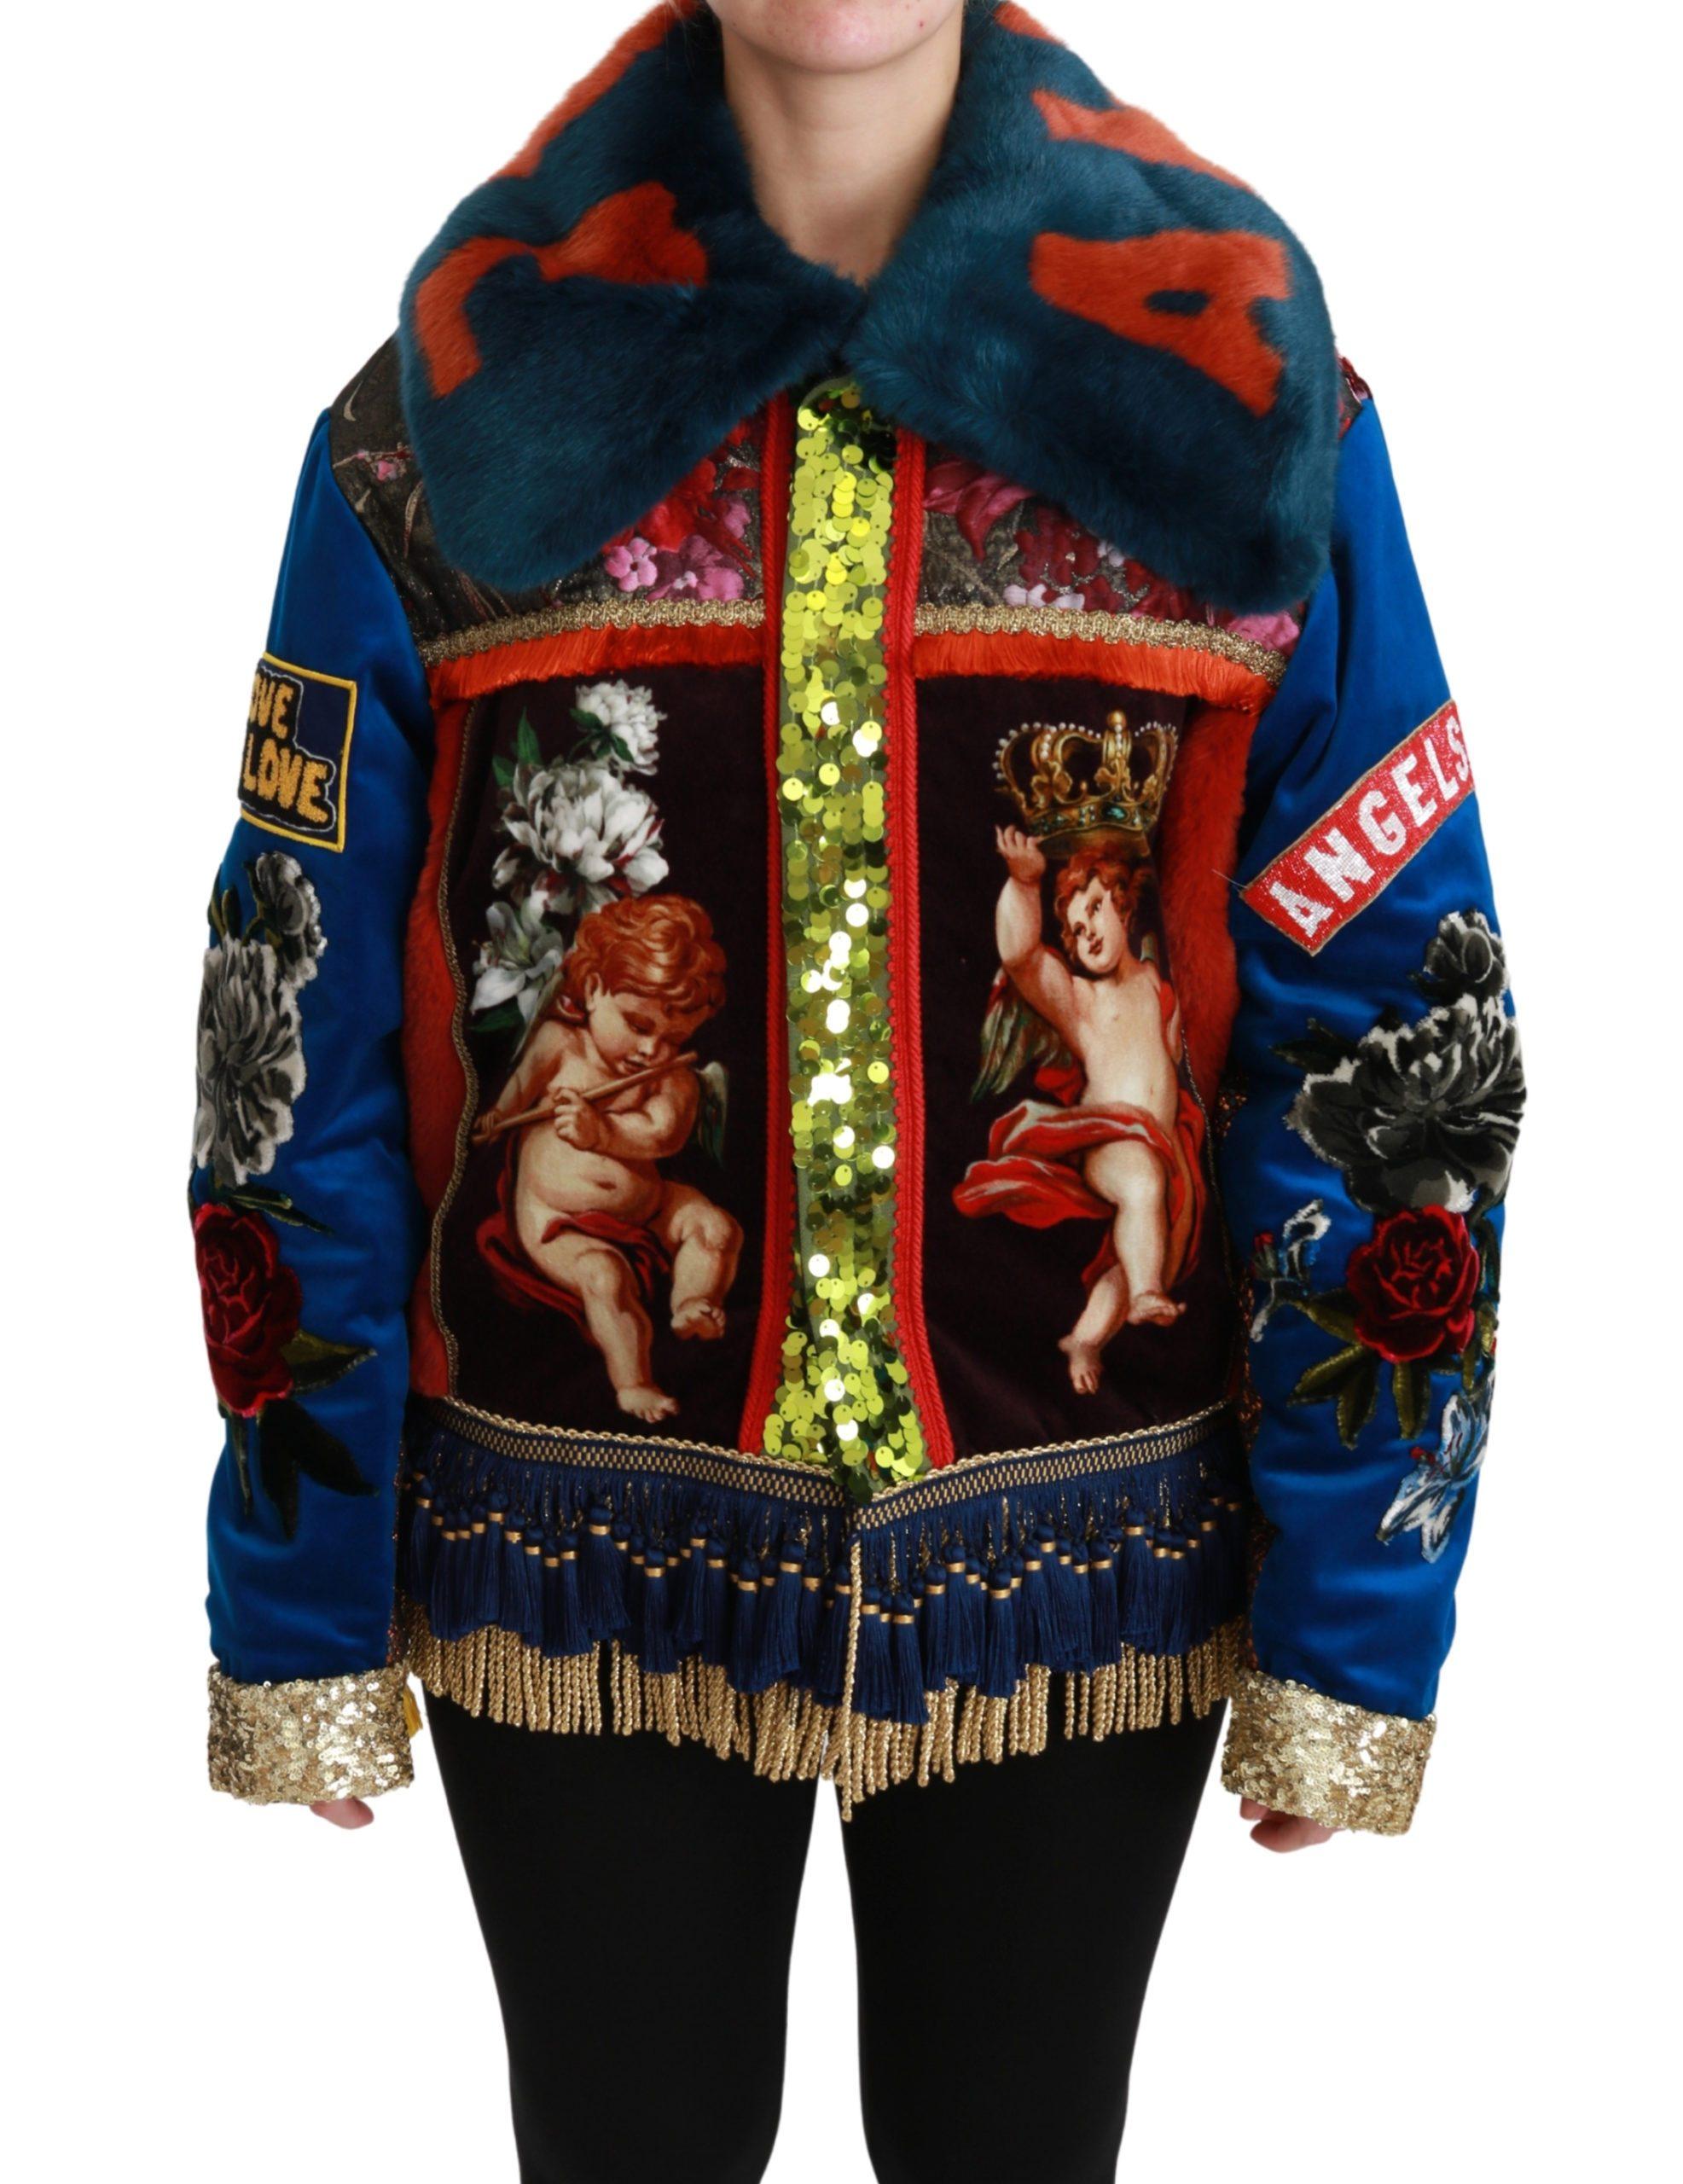 Dolce & Gabbana Women's Angel Floral Sequined Coat Jacket Multicolor JKT2525 - IT40|S